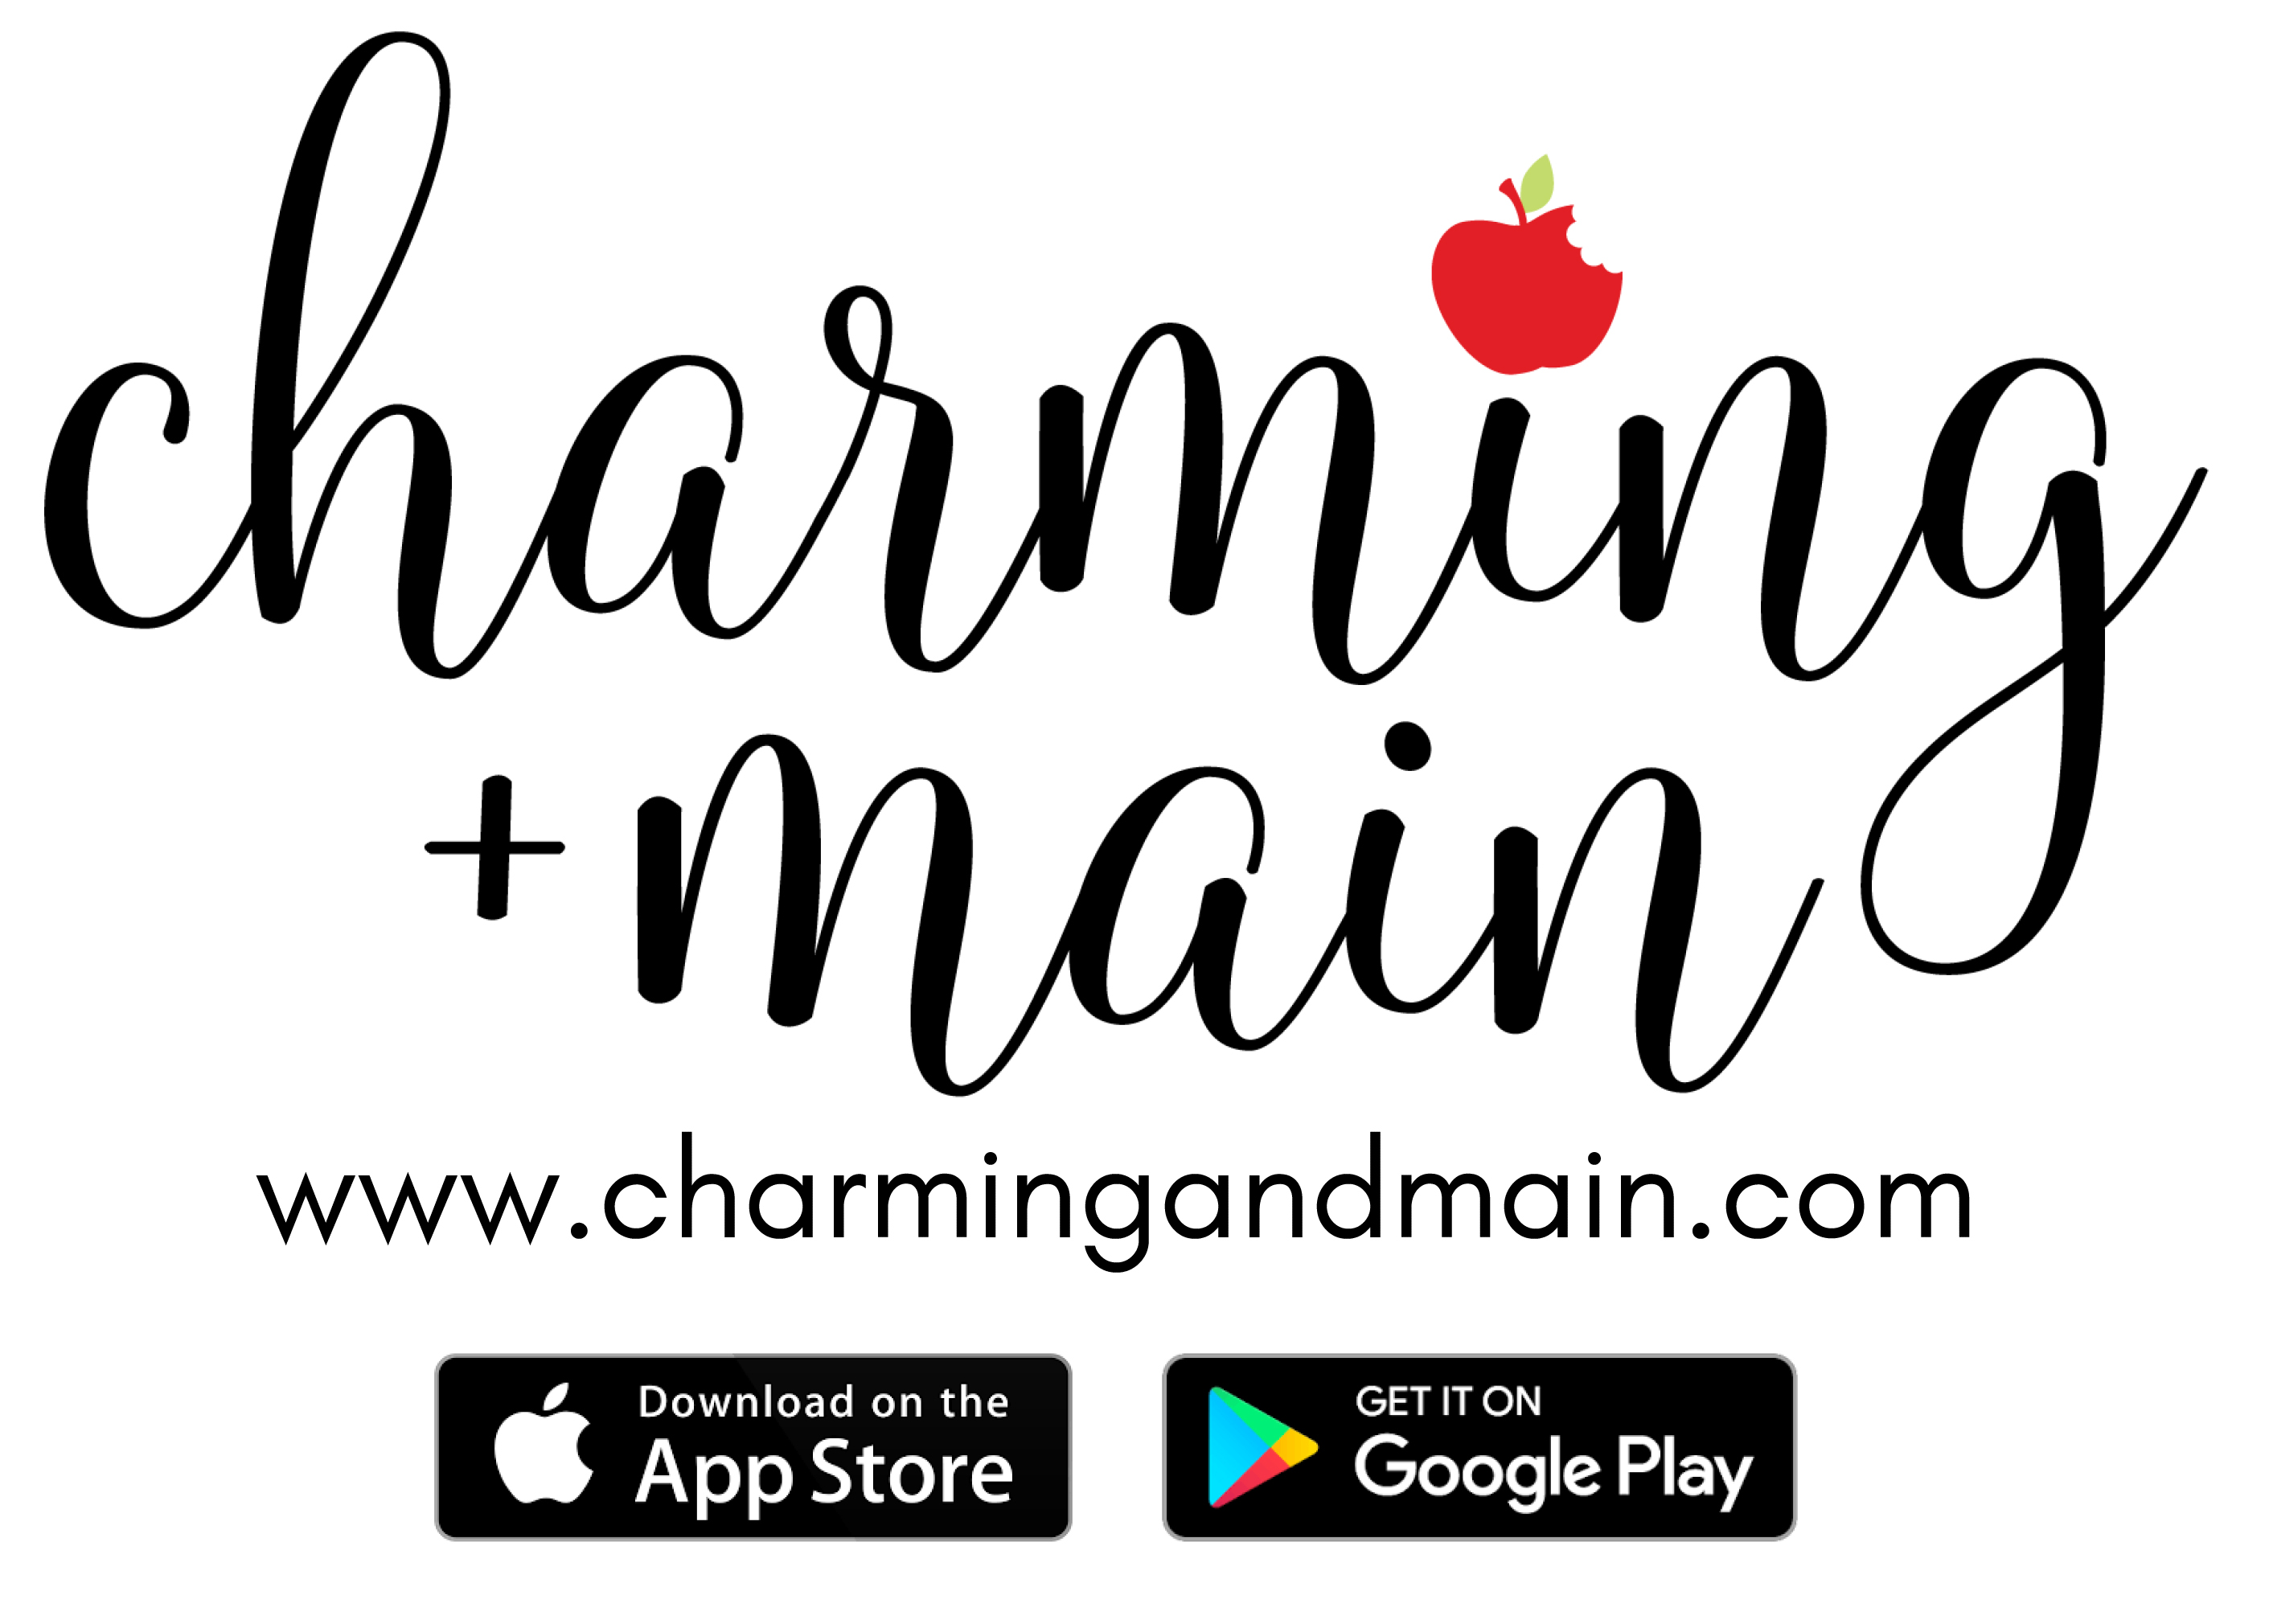 Charming + Main